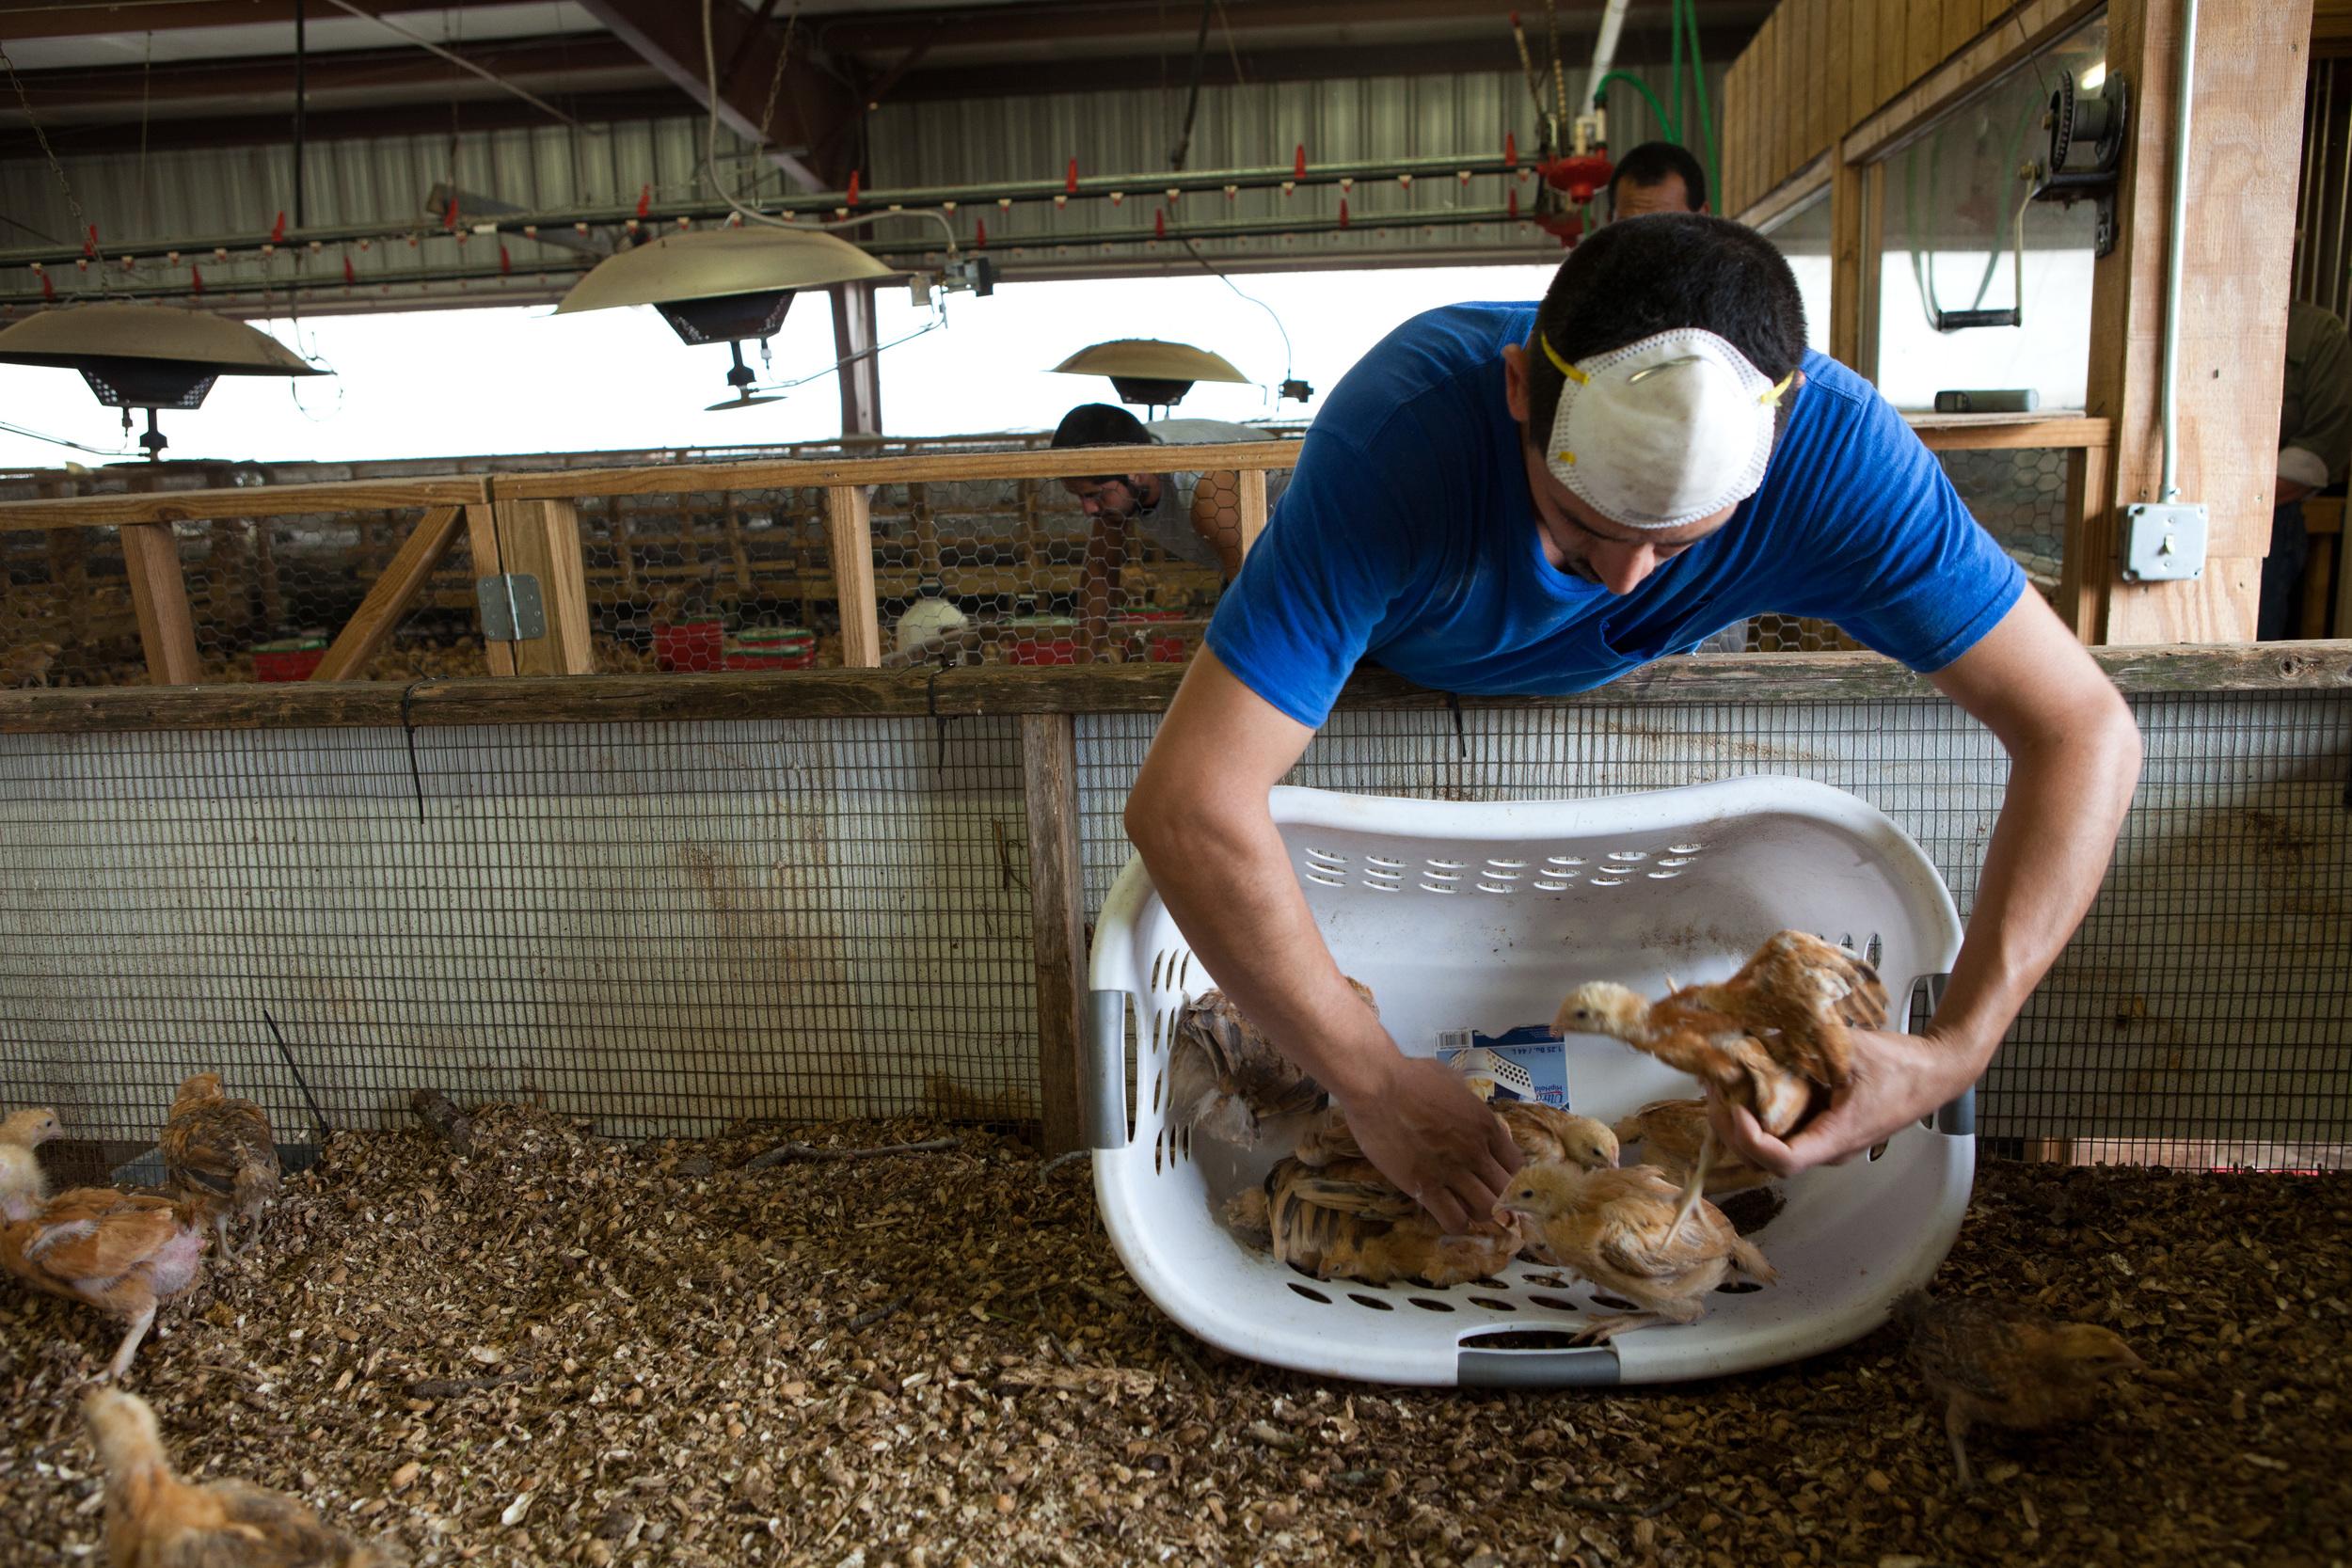 Will Harris & White Oak Pastures Farm: The Dirt Underneath